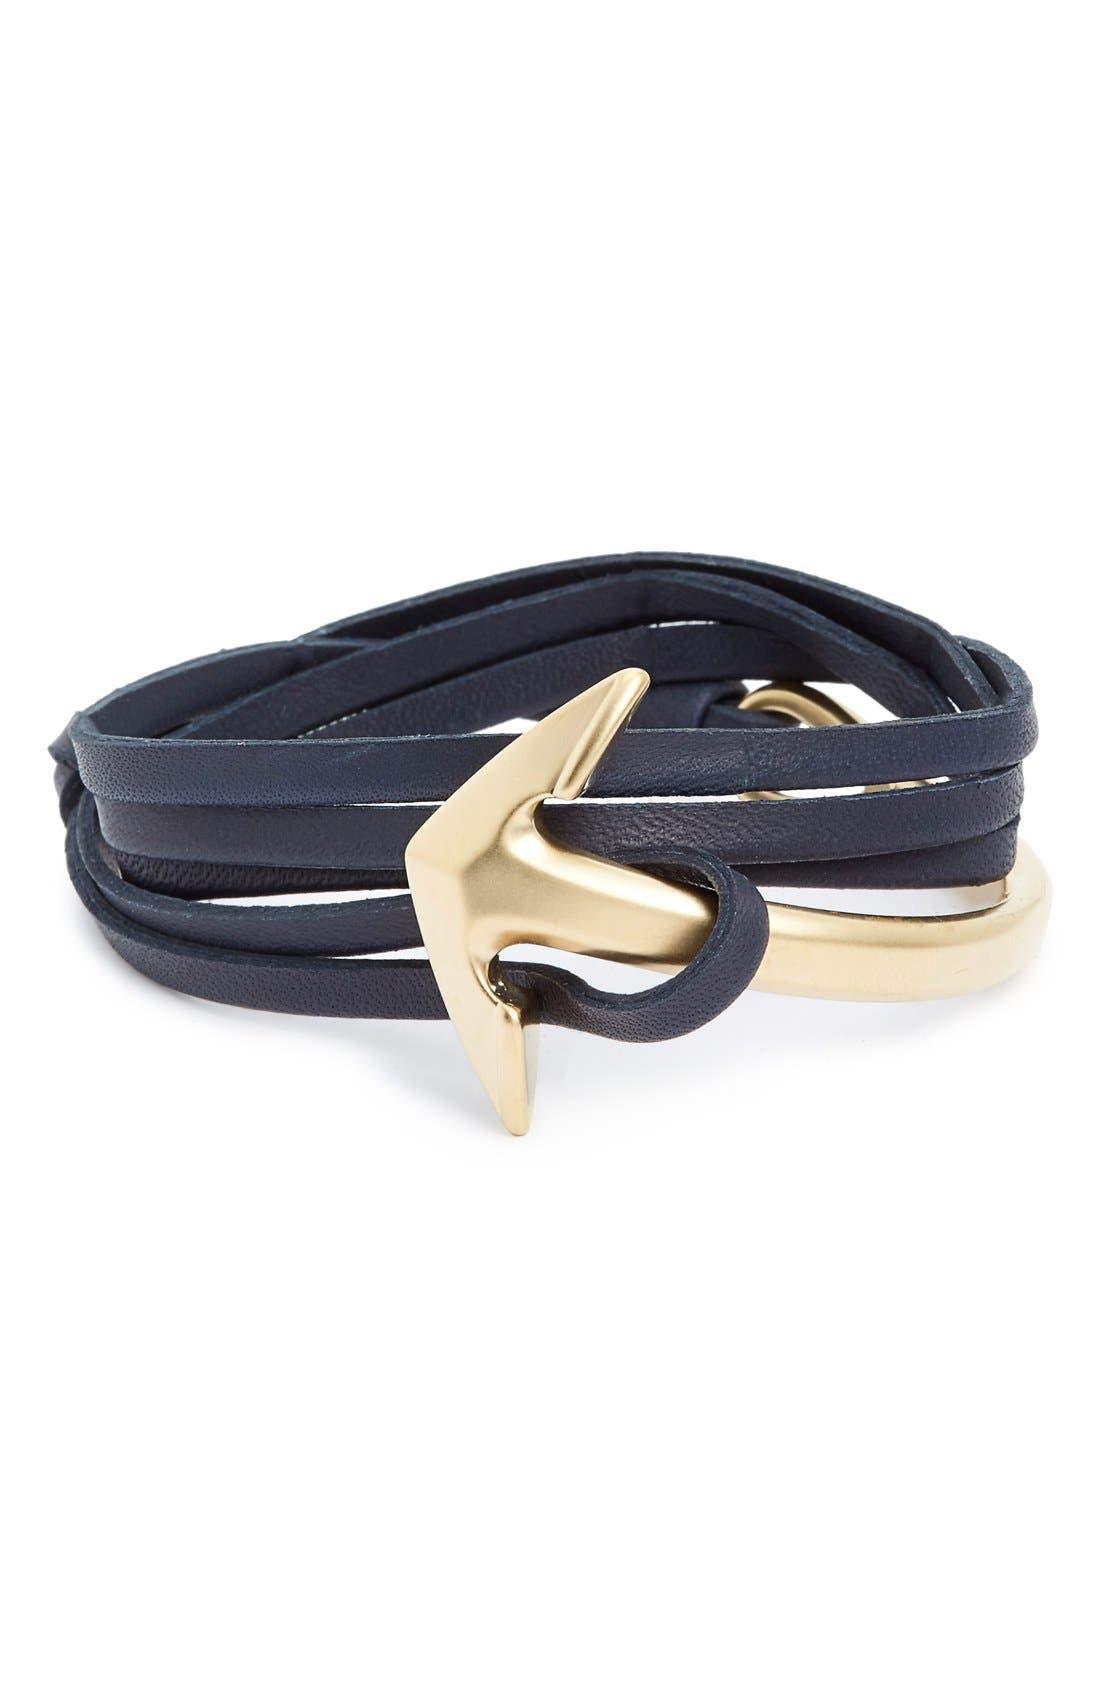 MIANSAI Half Cuff Anchor Leather Wrap Bracelet